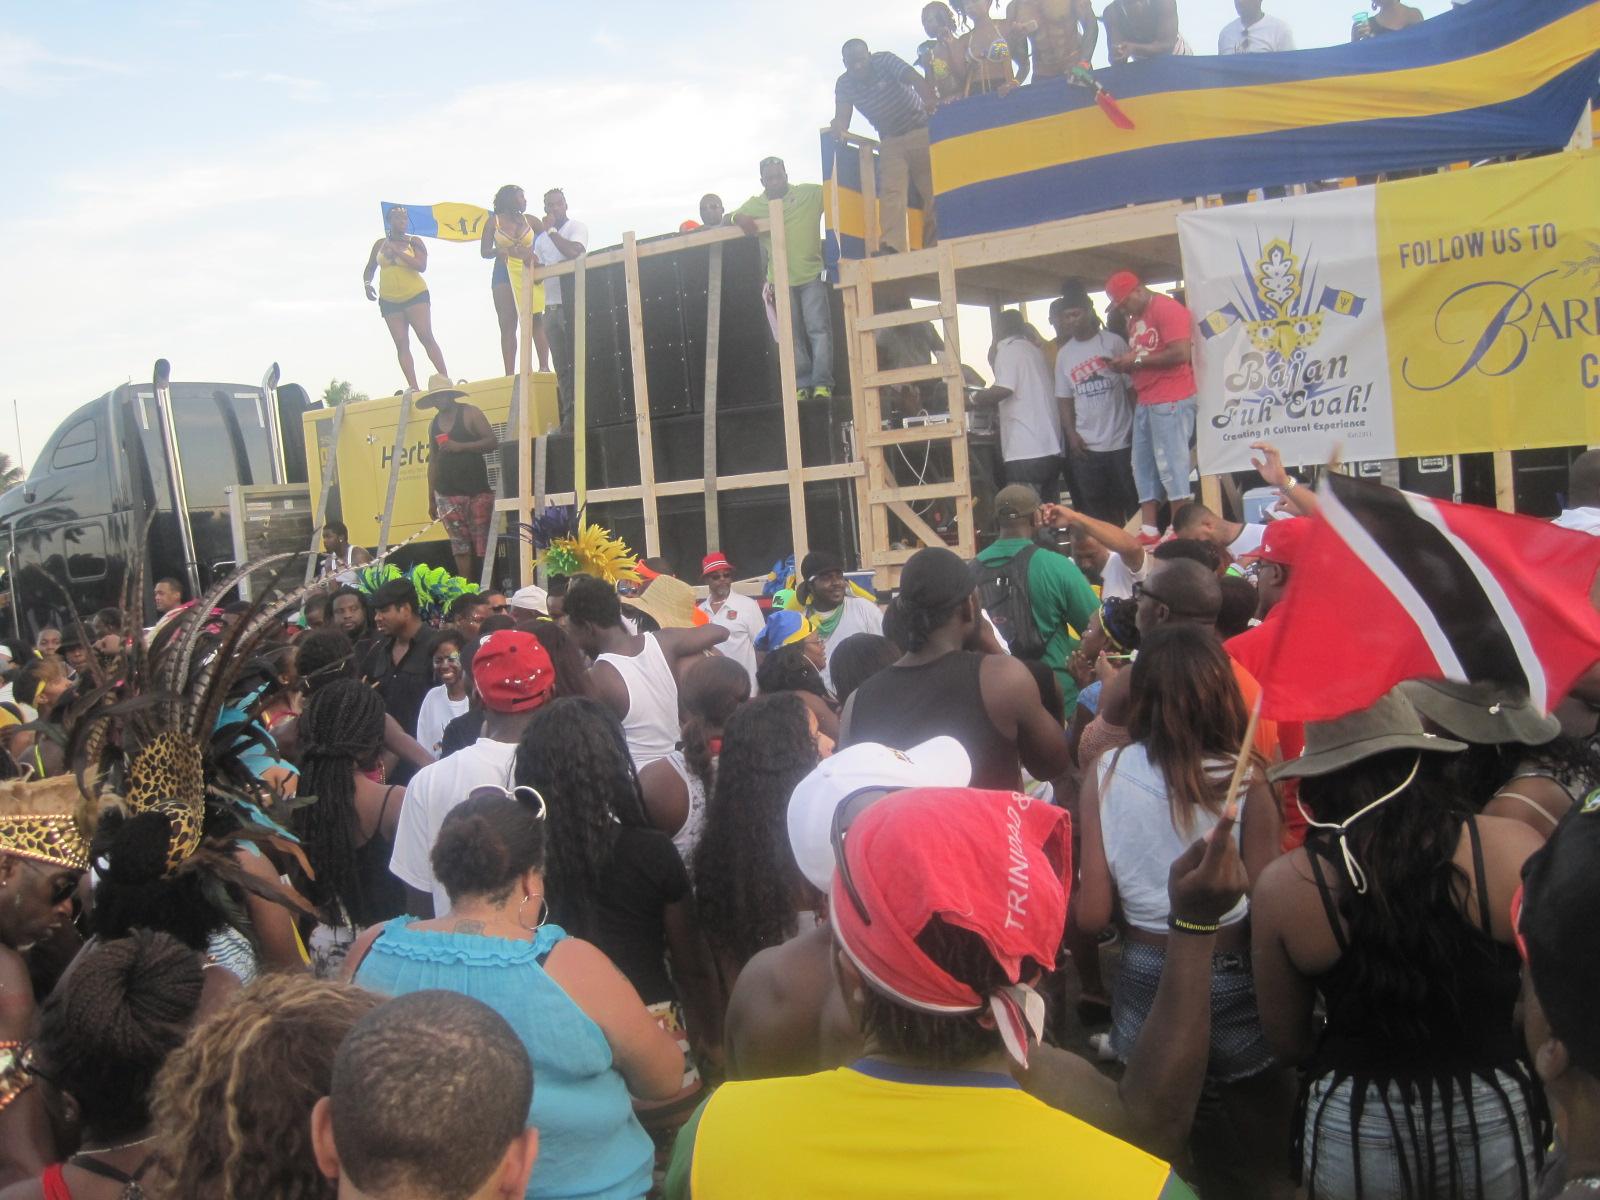 Party by the trucks - Sun Life Stadium